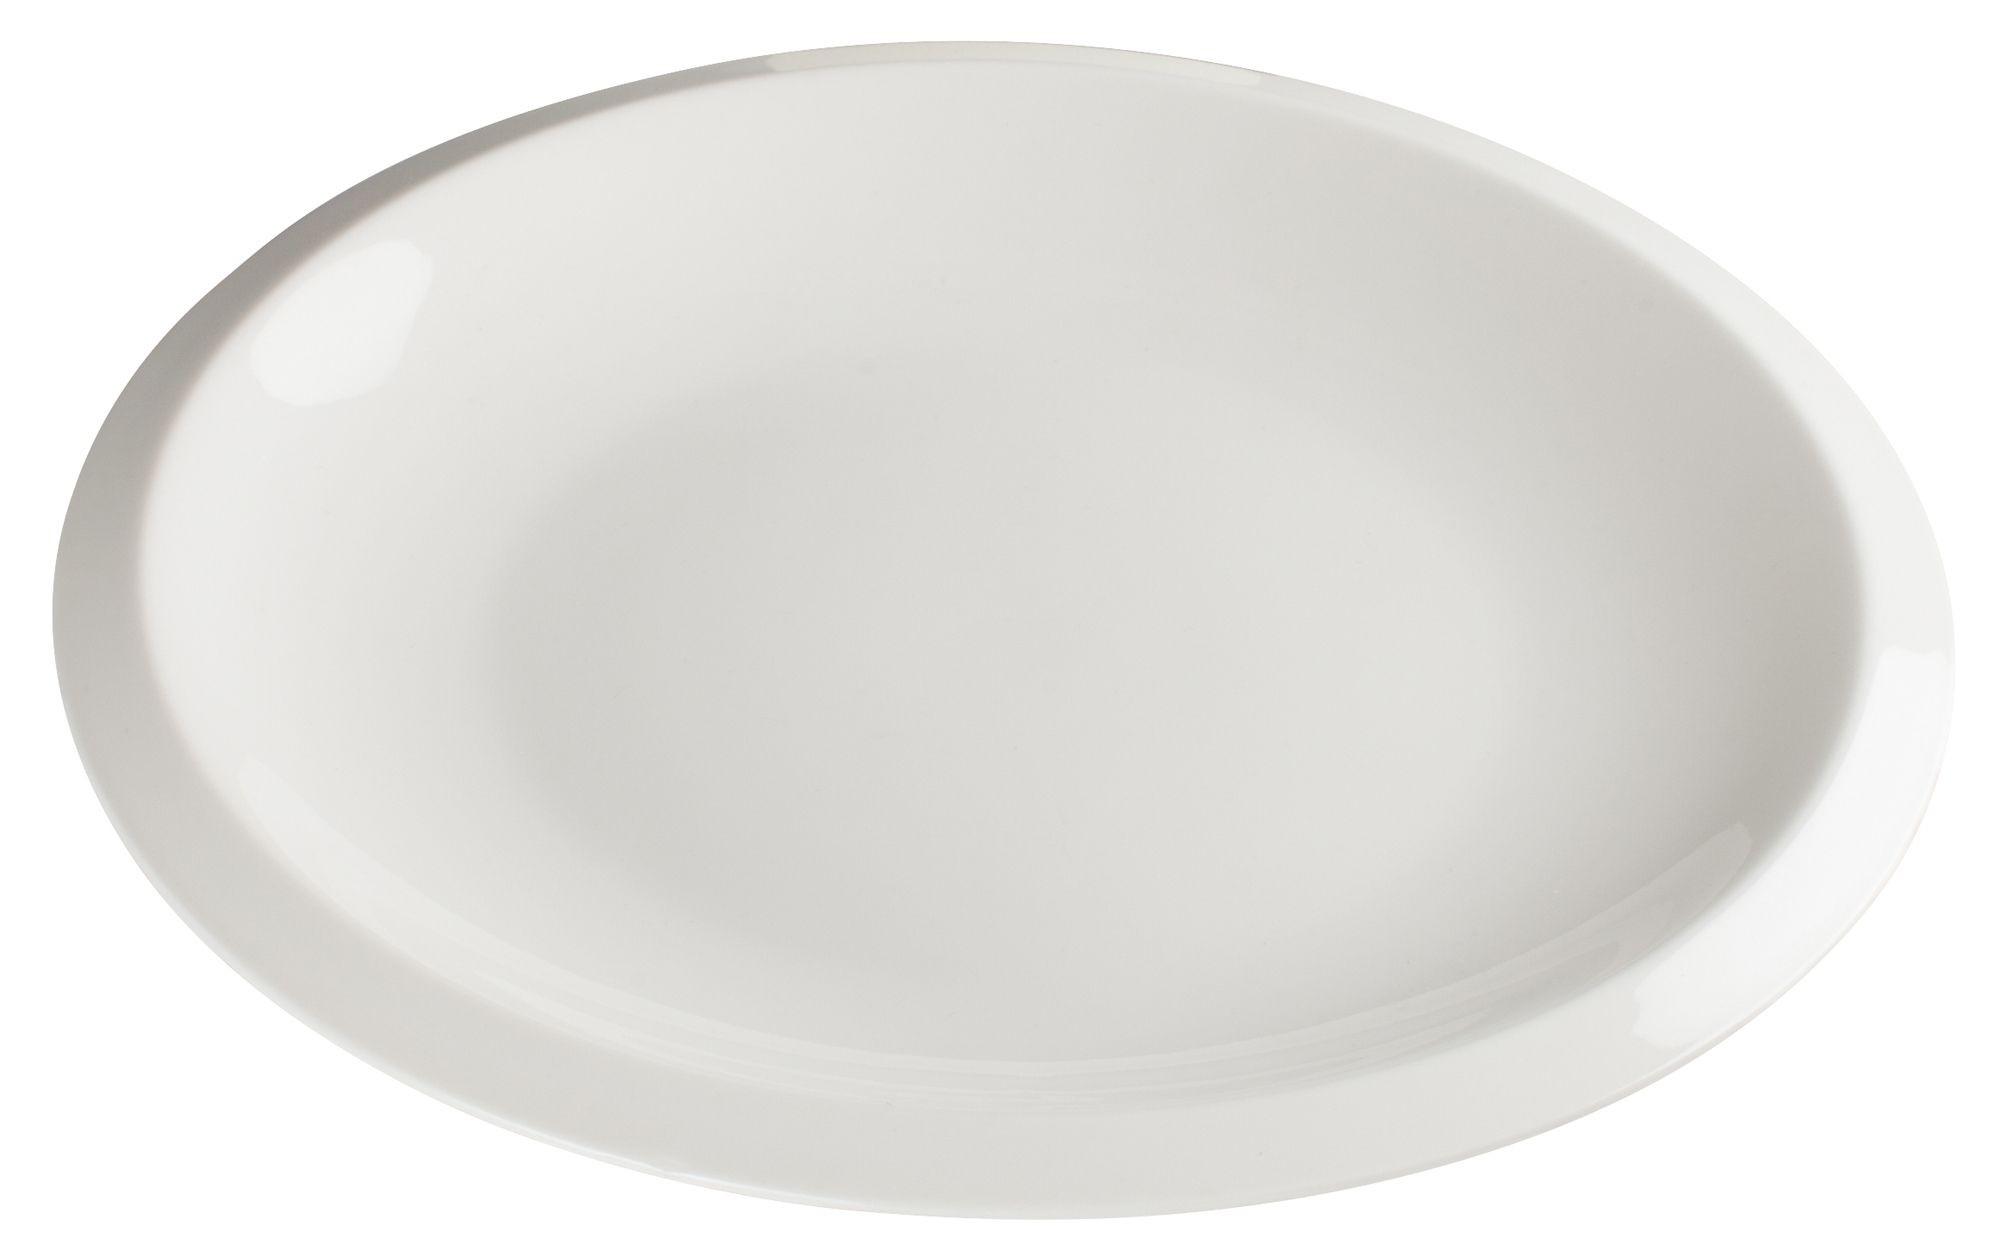 "Winco WDP006-201 Bergomi Creamy White Porcelain Round Platter 8"" Dia."